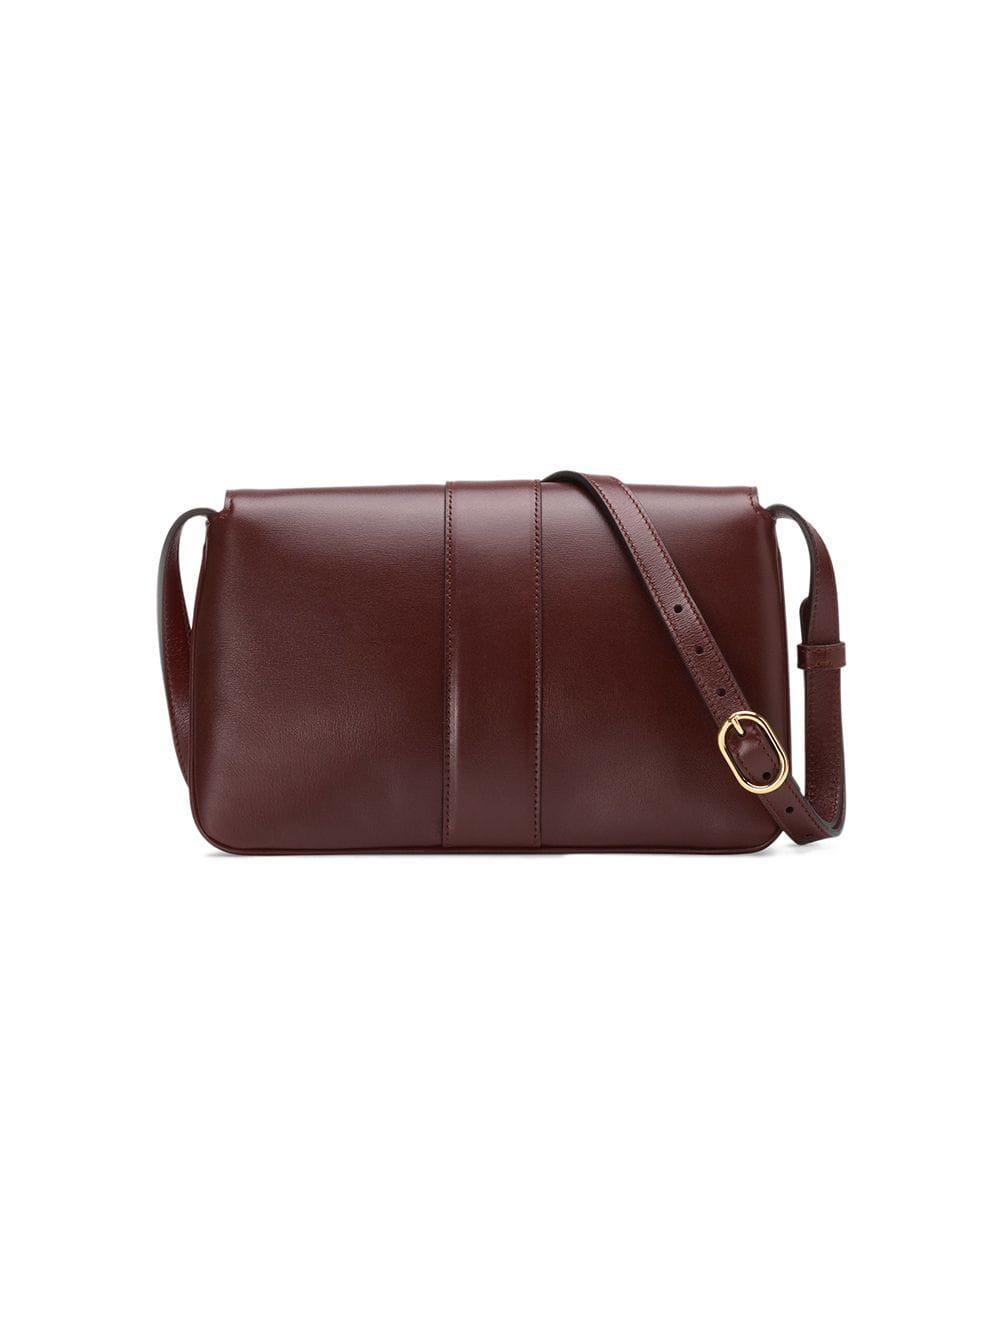 4056b85c7650 Gucci Arli Small Shoulder Bag in Red - Lyst